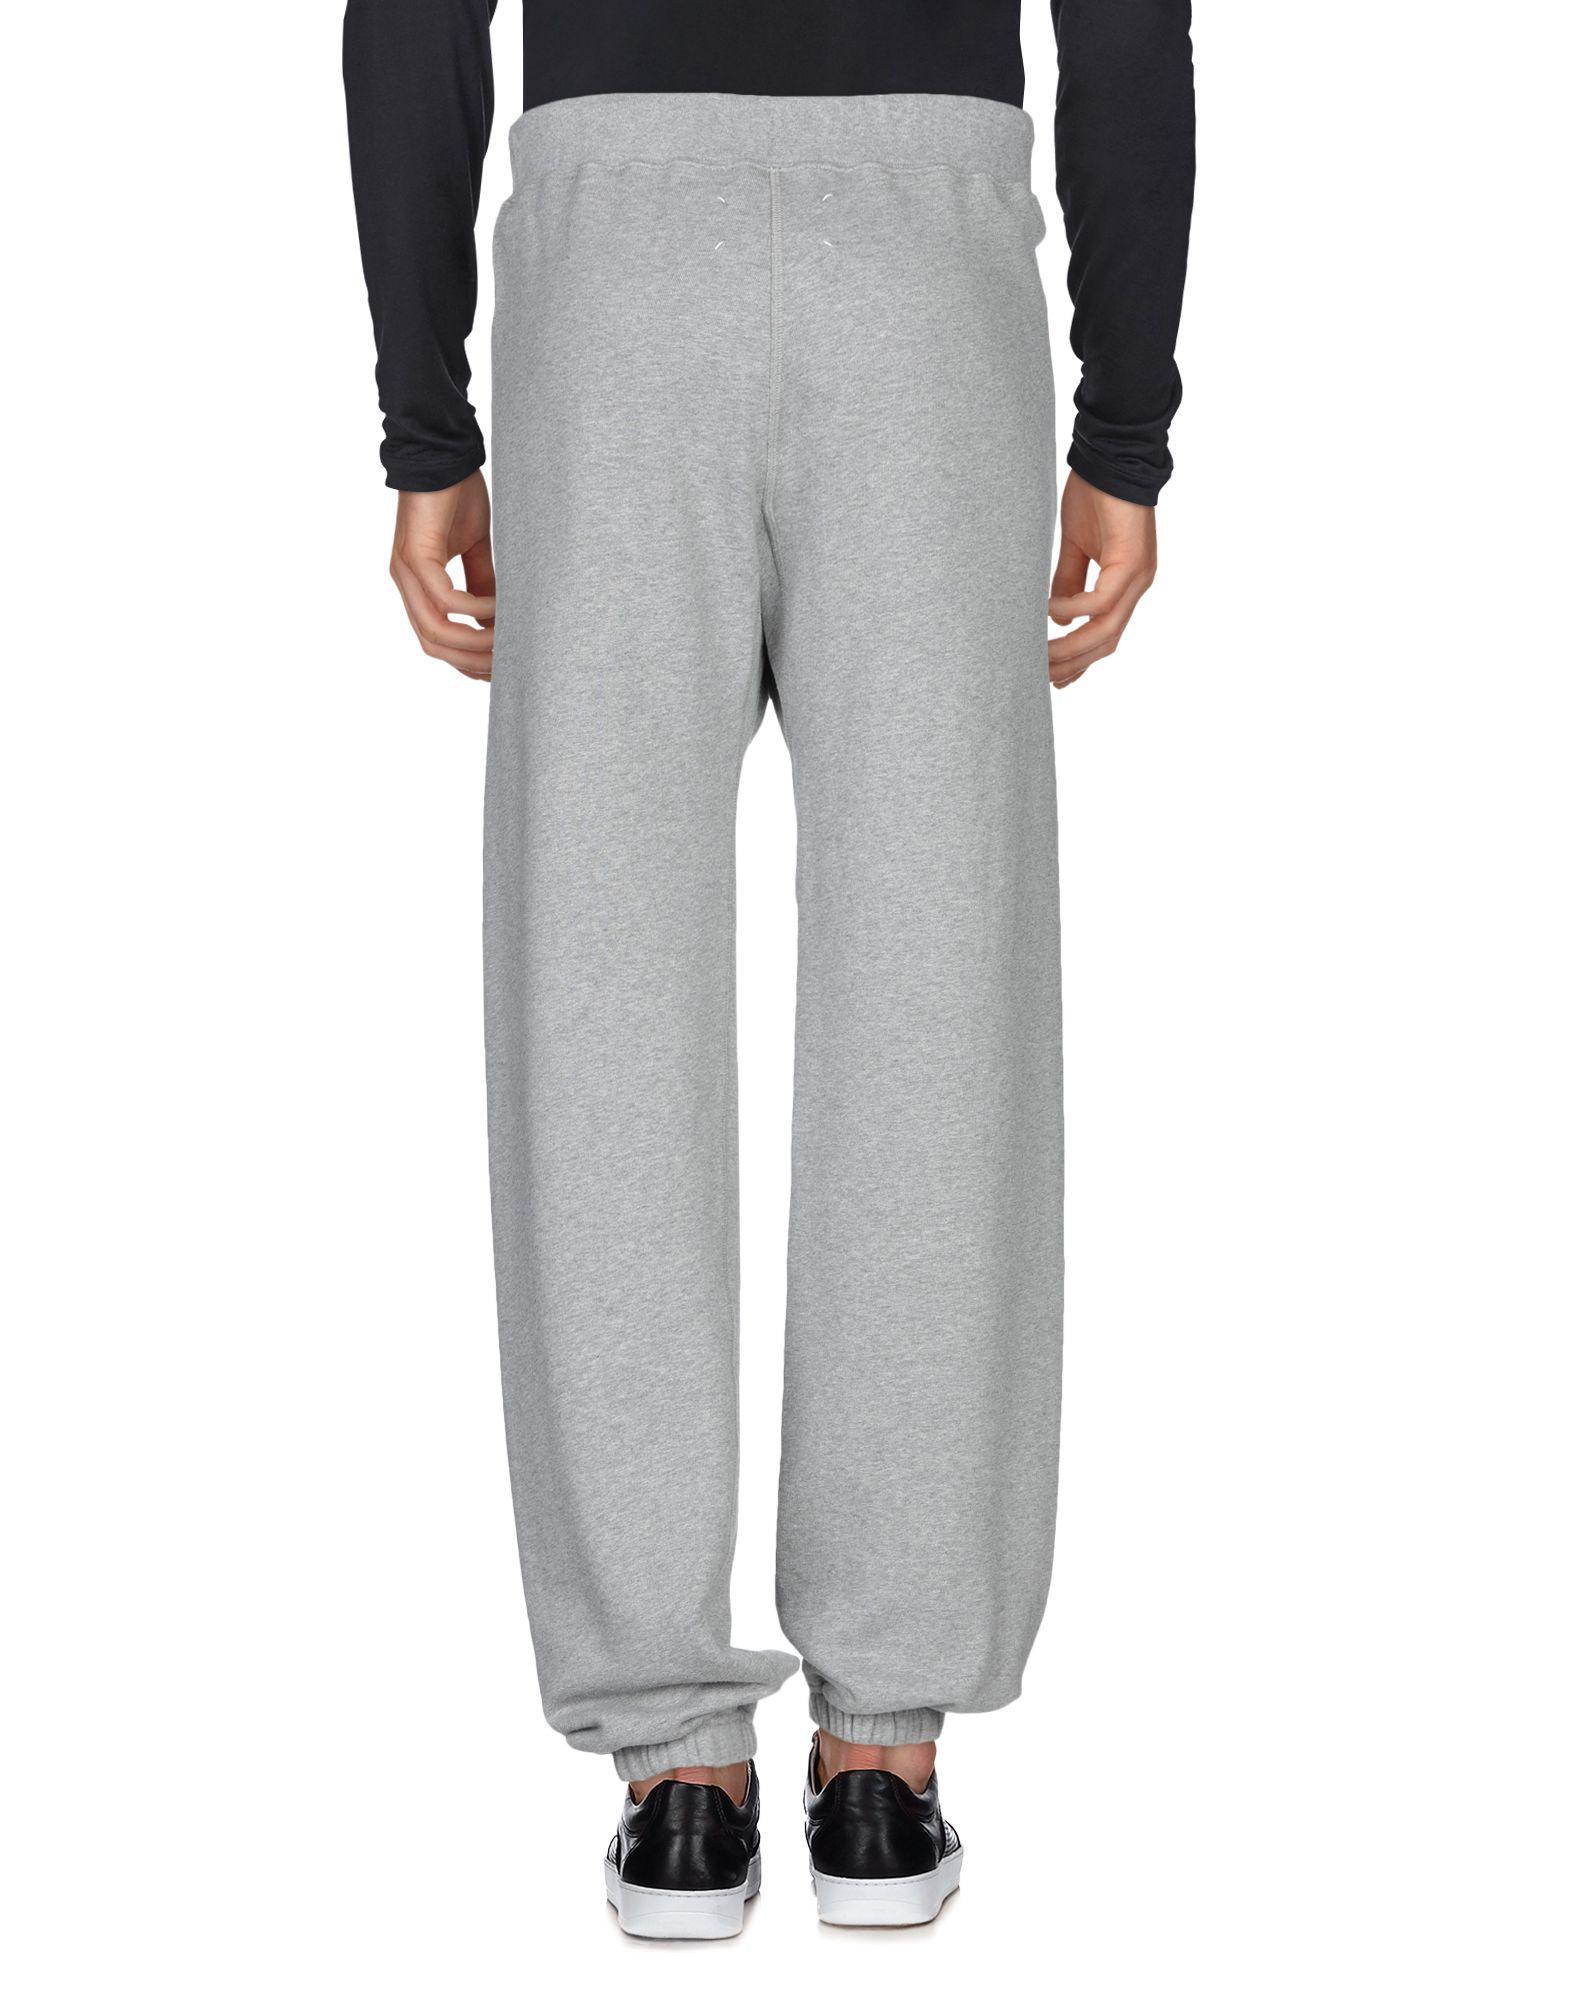 Maison Margiela Fleece Casual Pants in Grey (Grey) for Men